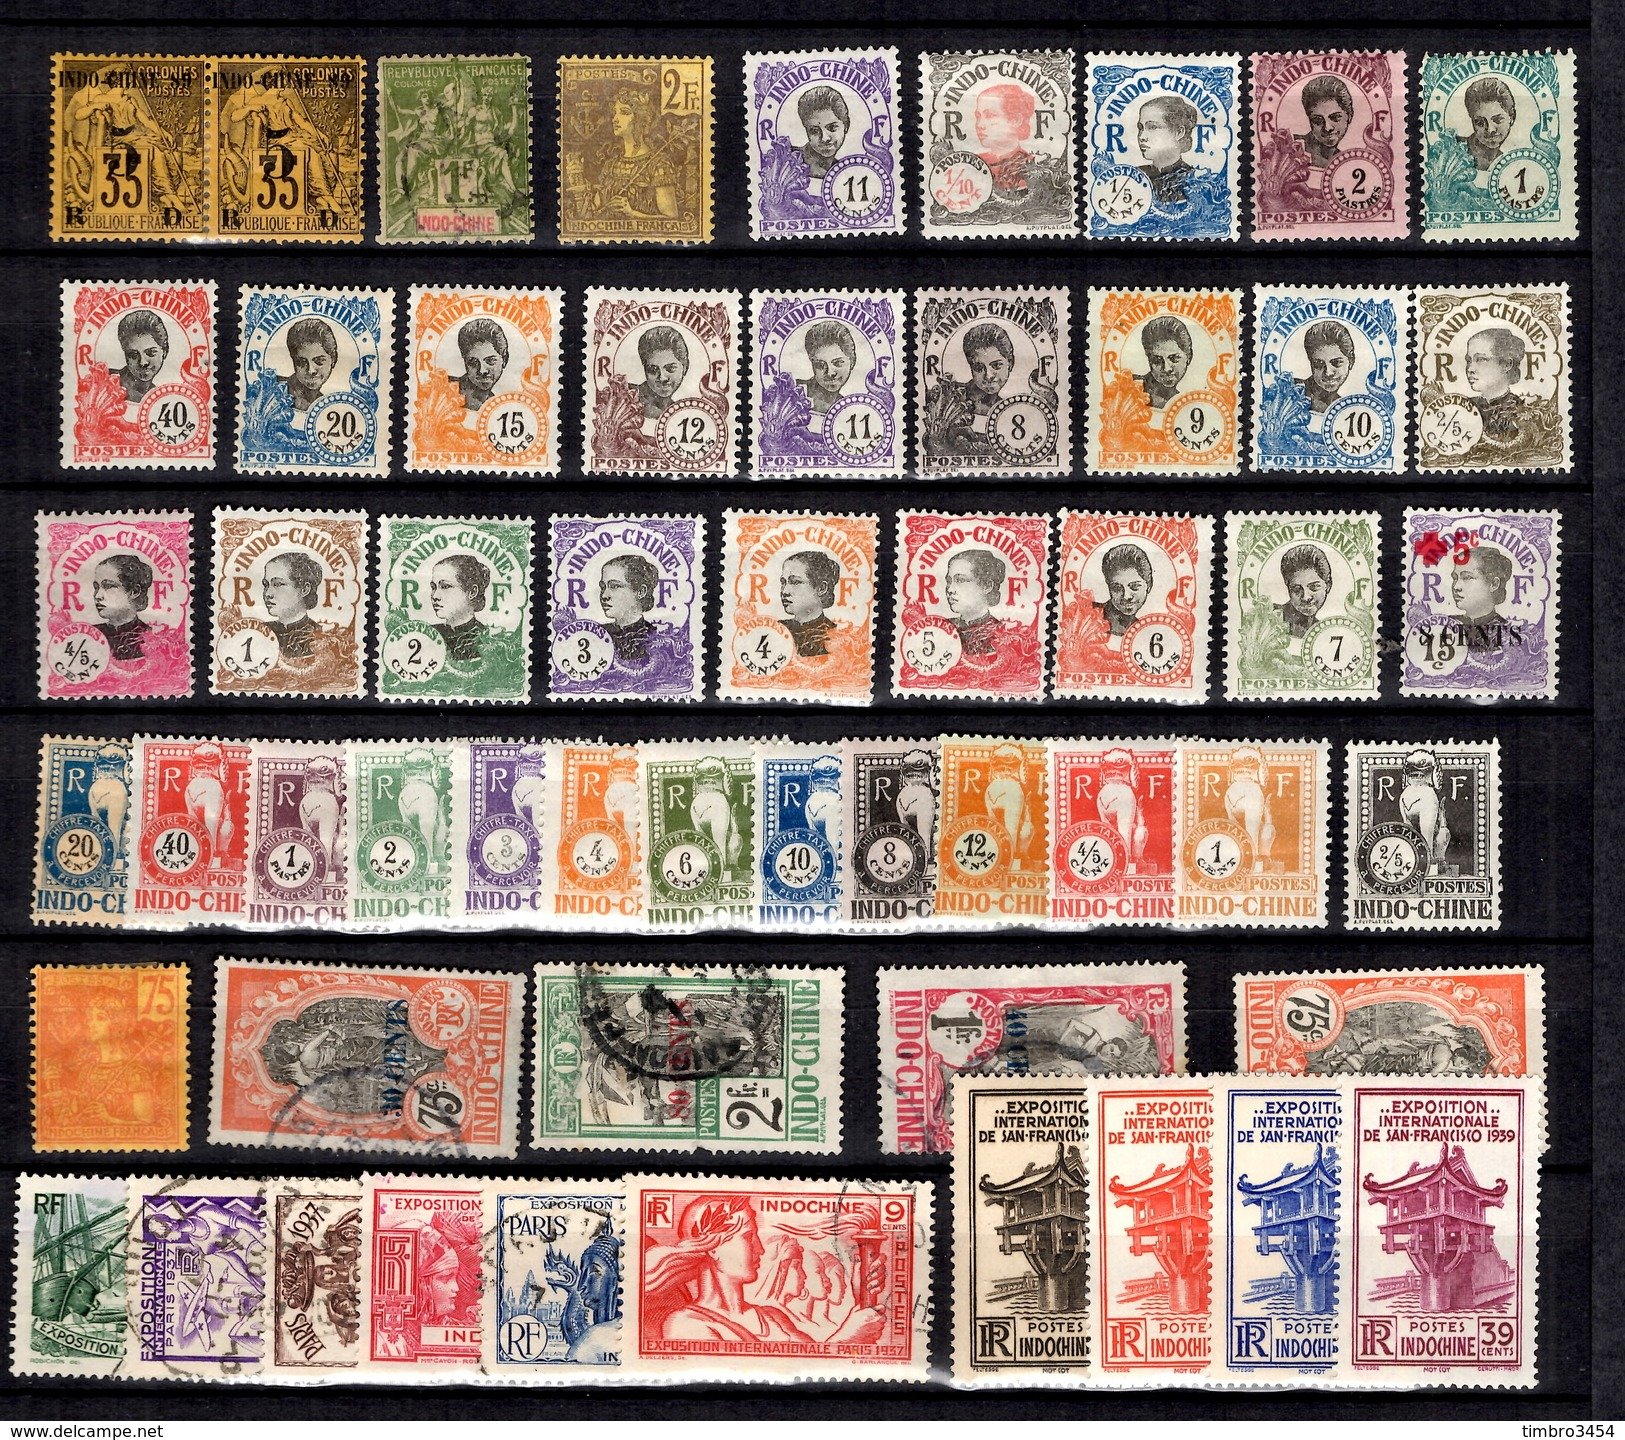 Indochine Belle Petite Collection D'anciens 1889/1937. Bonnes Valeurs. B/TB. A Saisir! - Indochina (1889-1945)